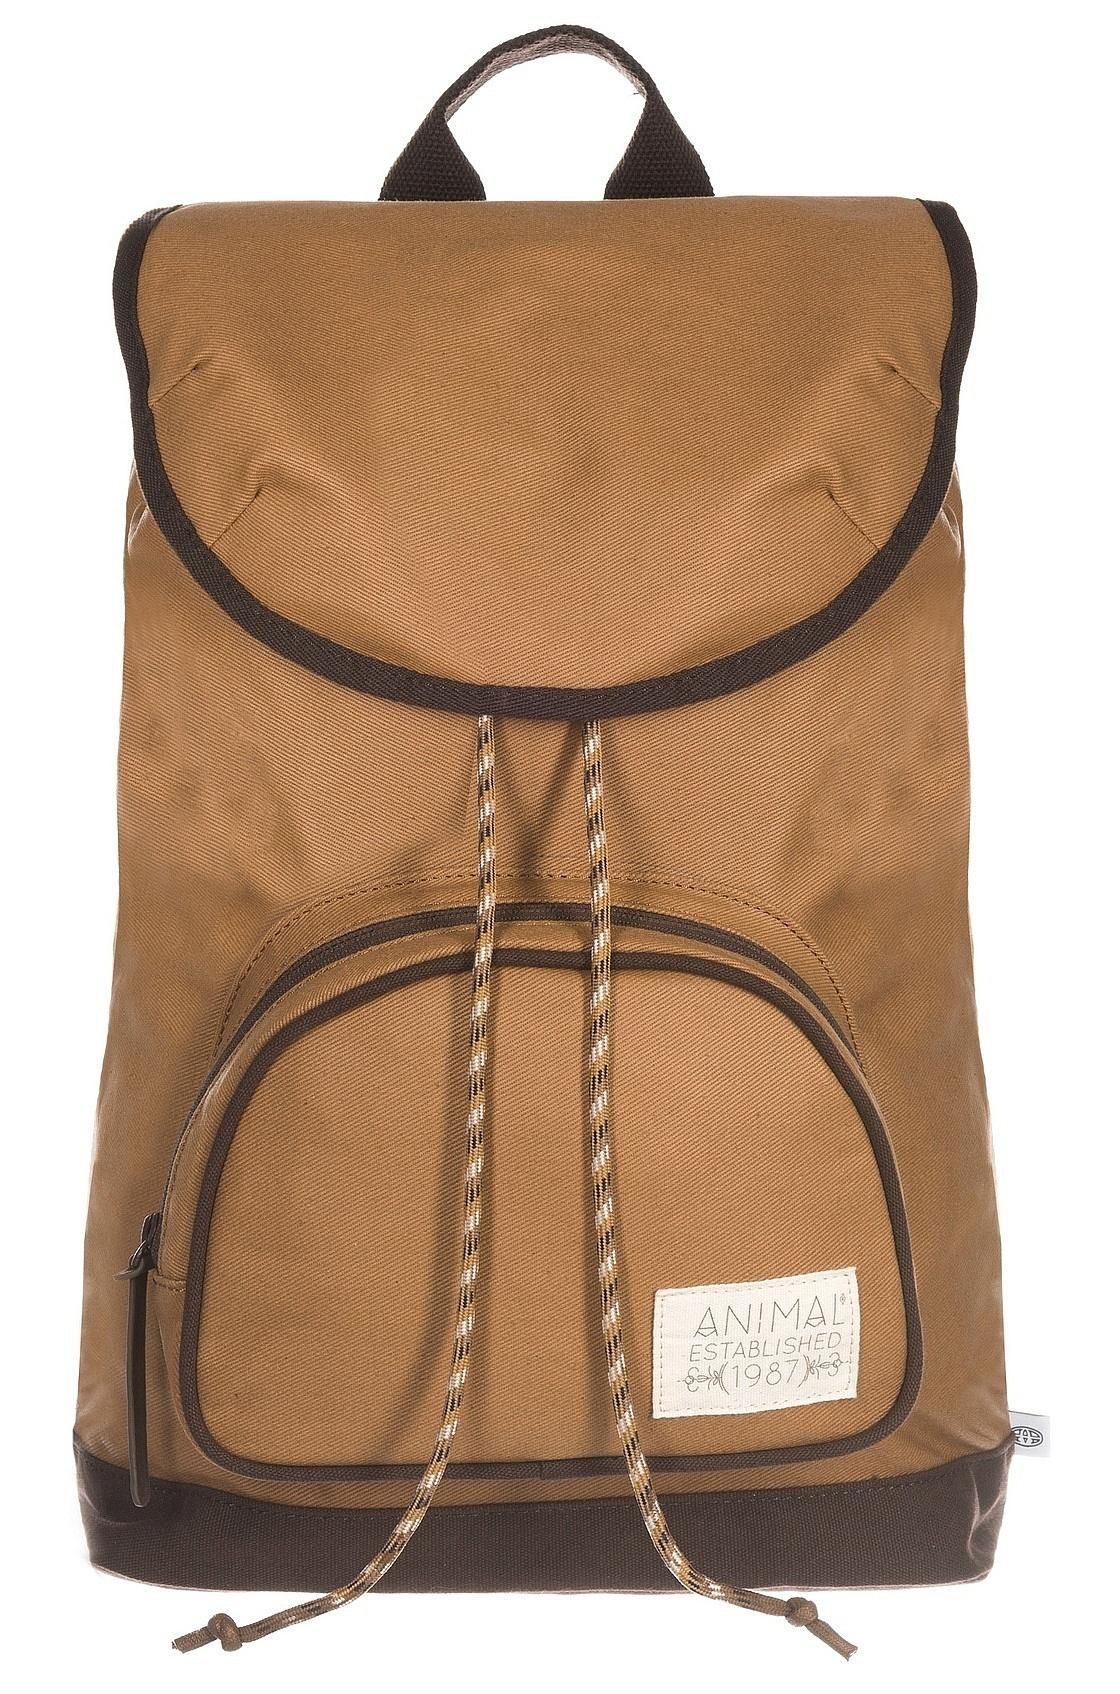 batoh Animal Alpine - Toffee Apple Brown 16 L 776712f17e